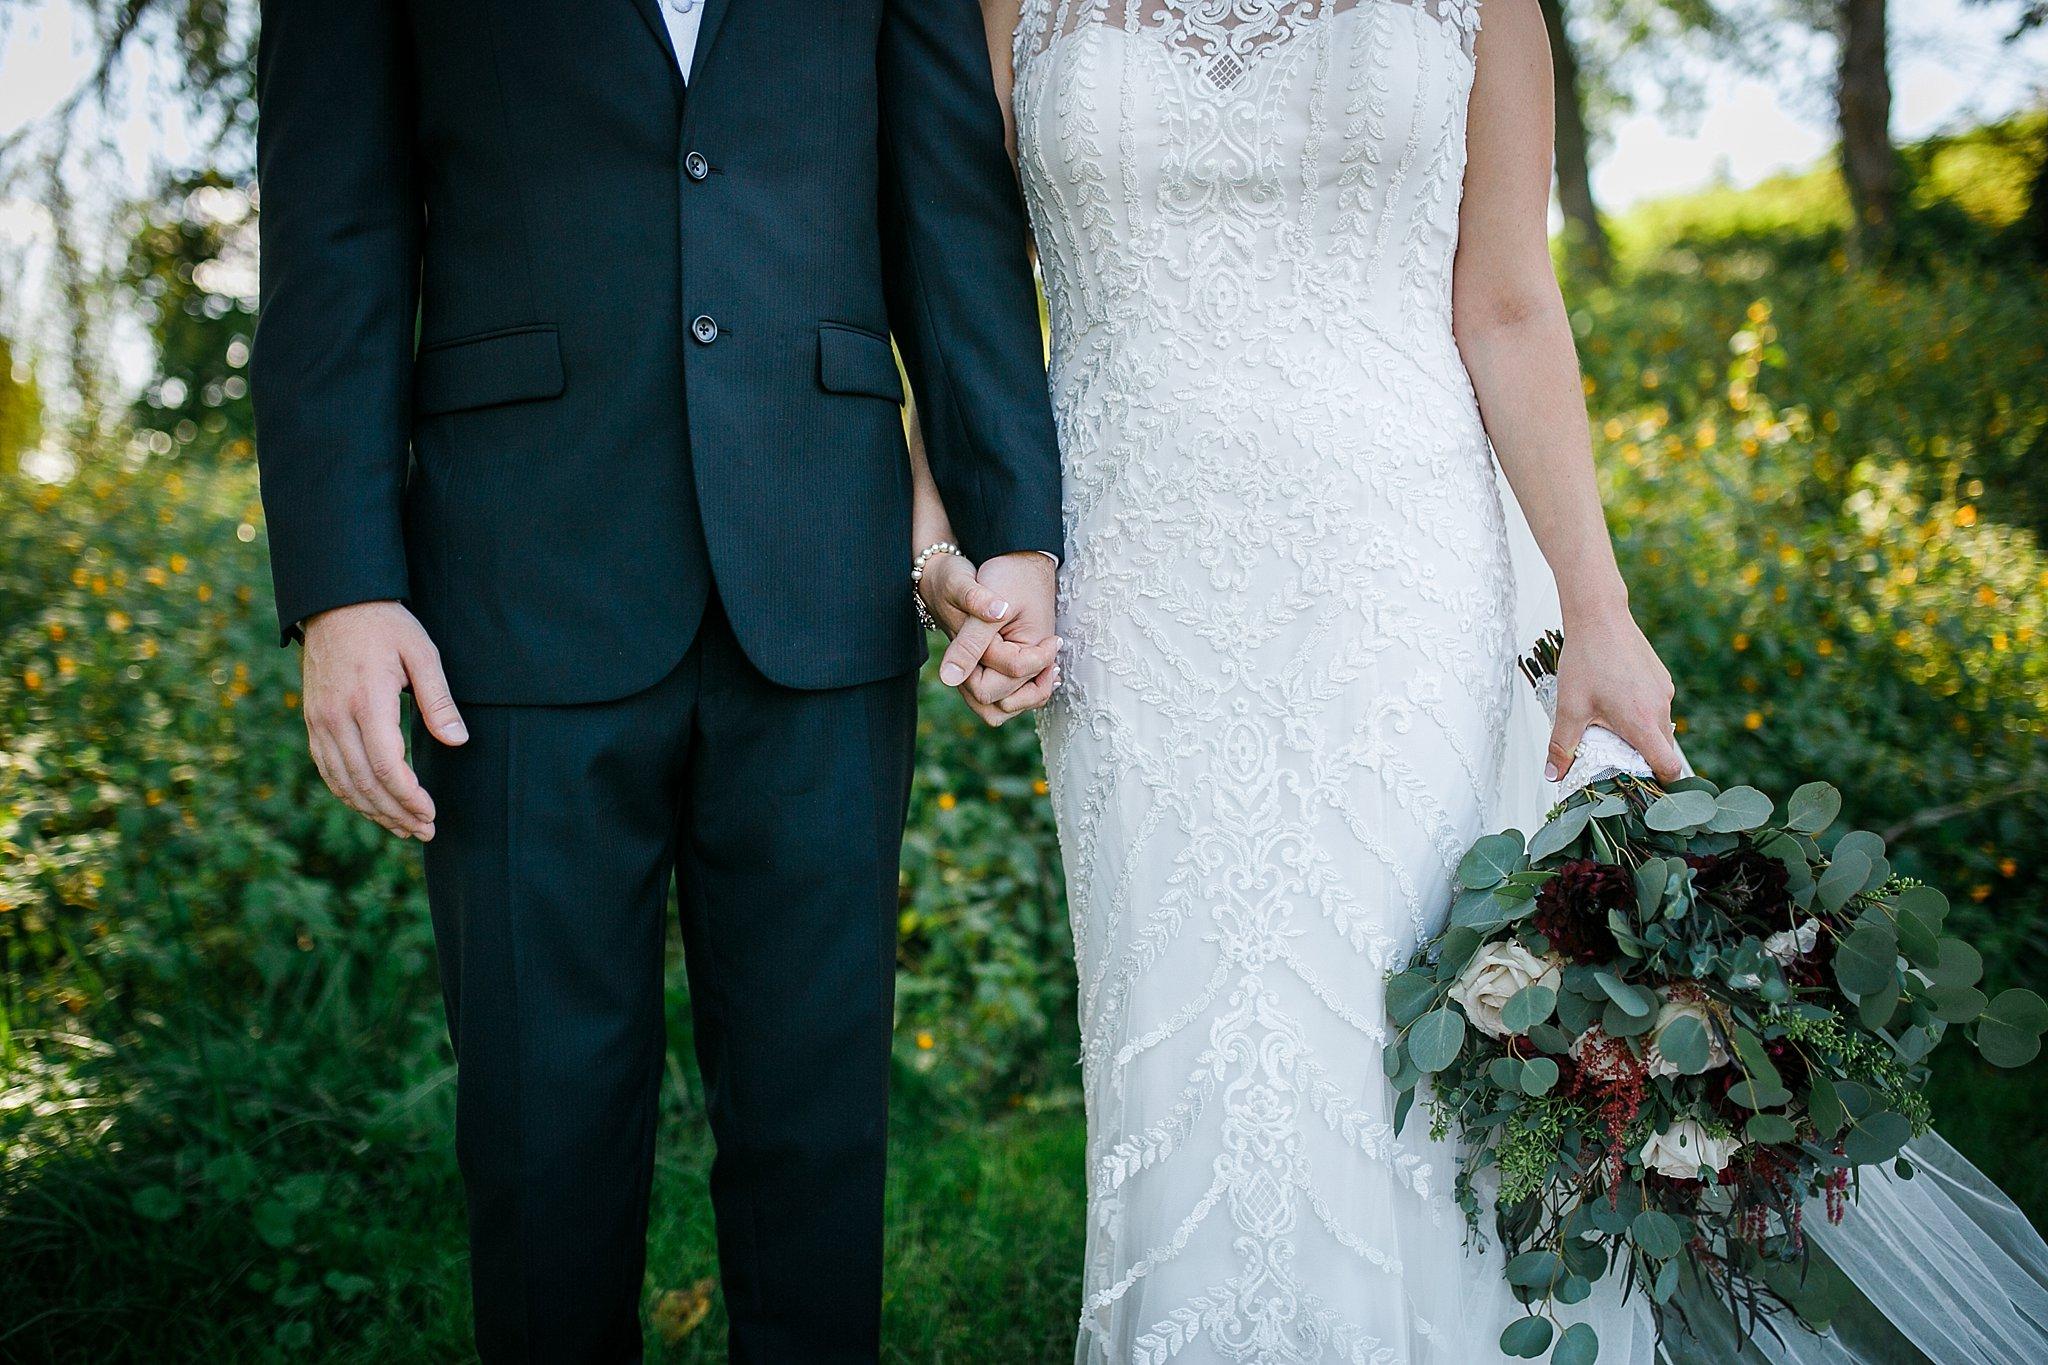 West Hills Country Club Wedding Gatsby Wedding Roaring Twenties Wedding Hudson Valley Wedding Photographer Sweet Alice Photography37.jpg